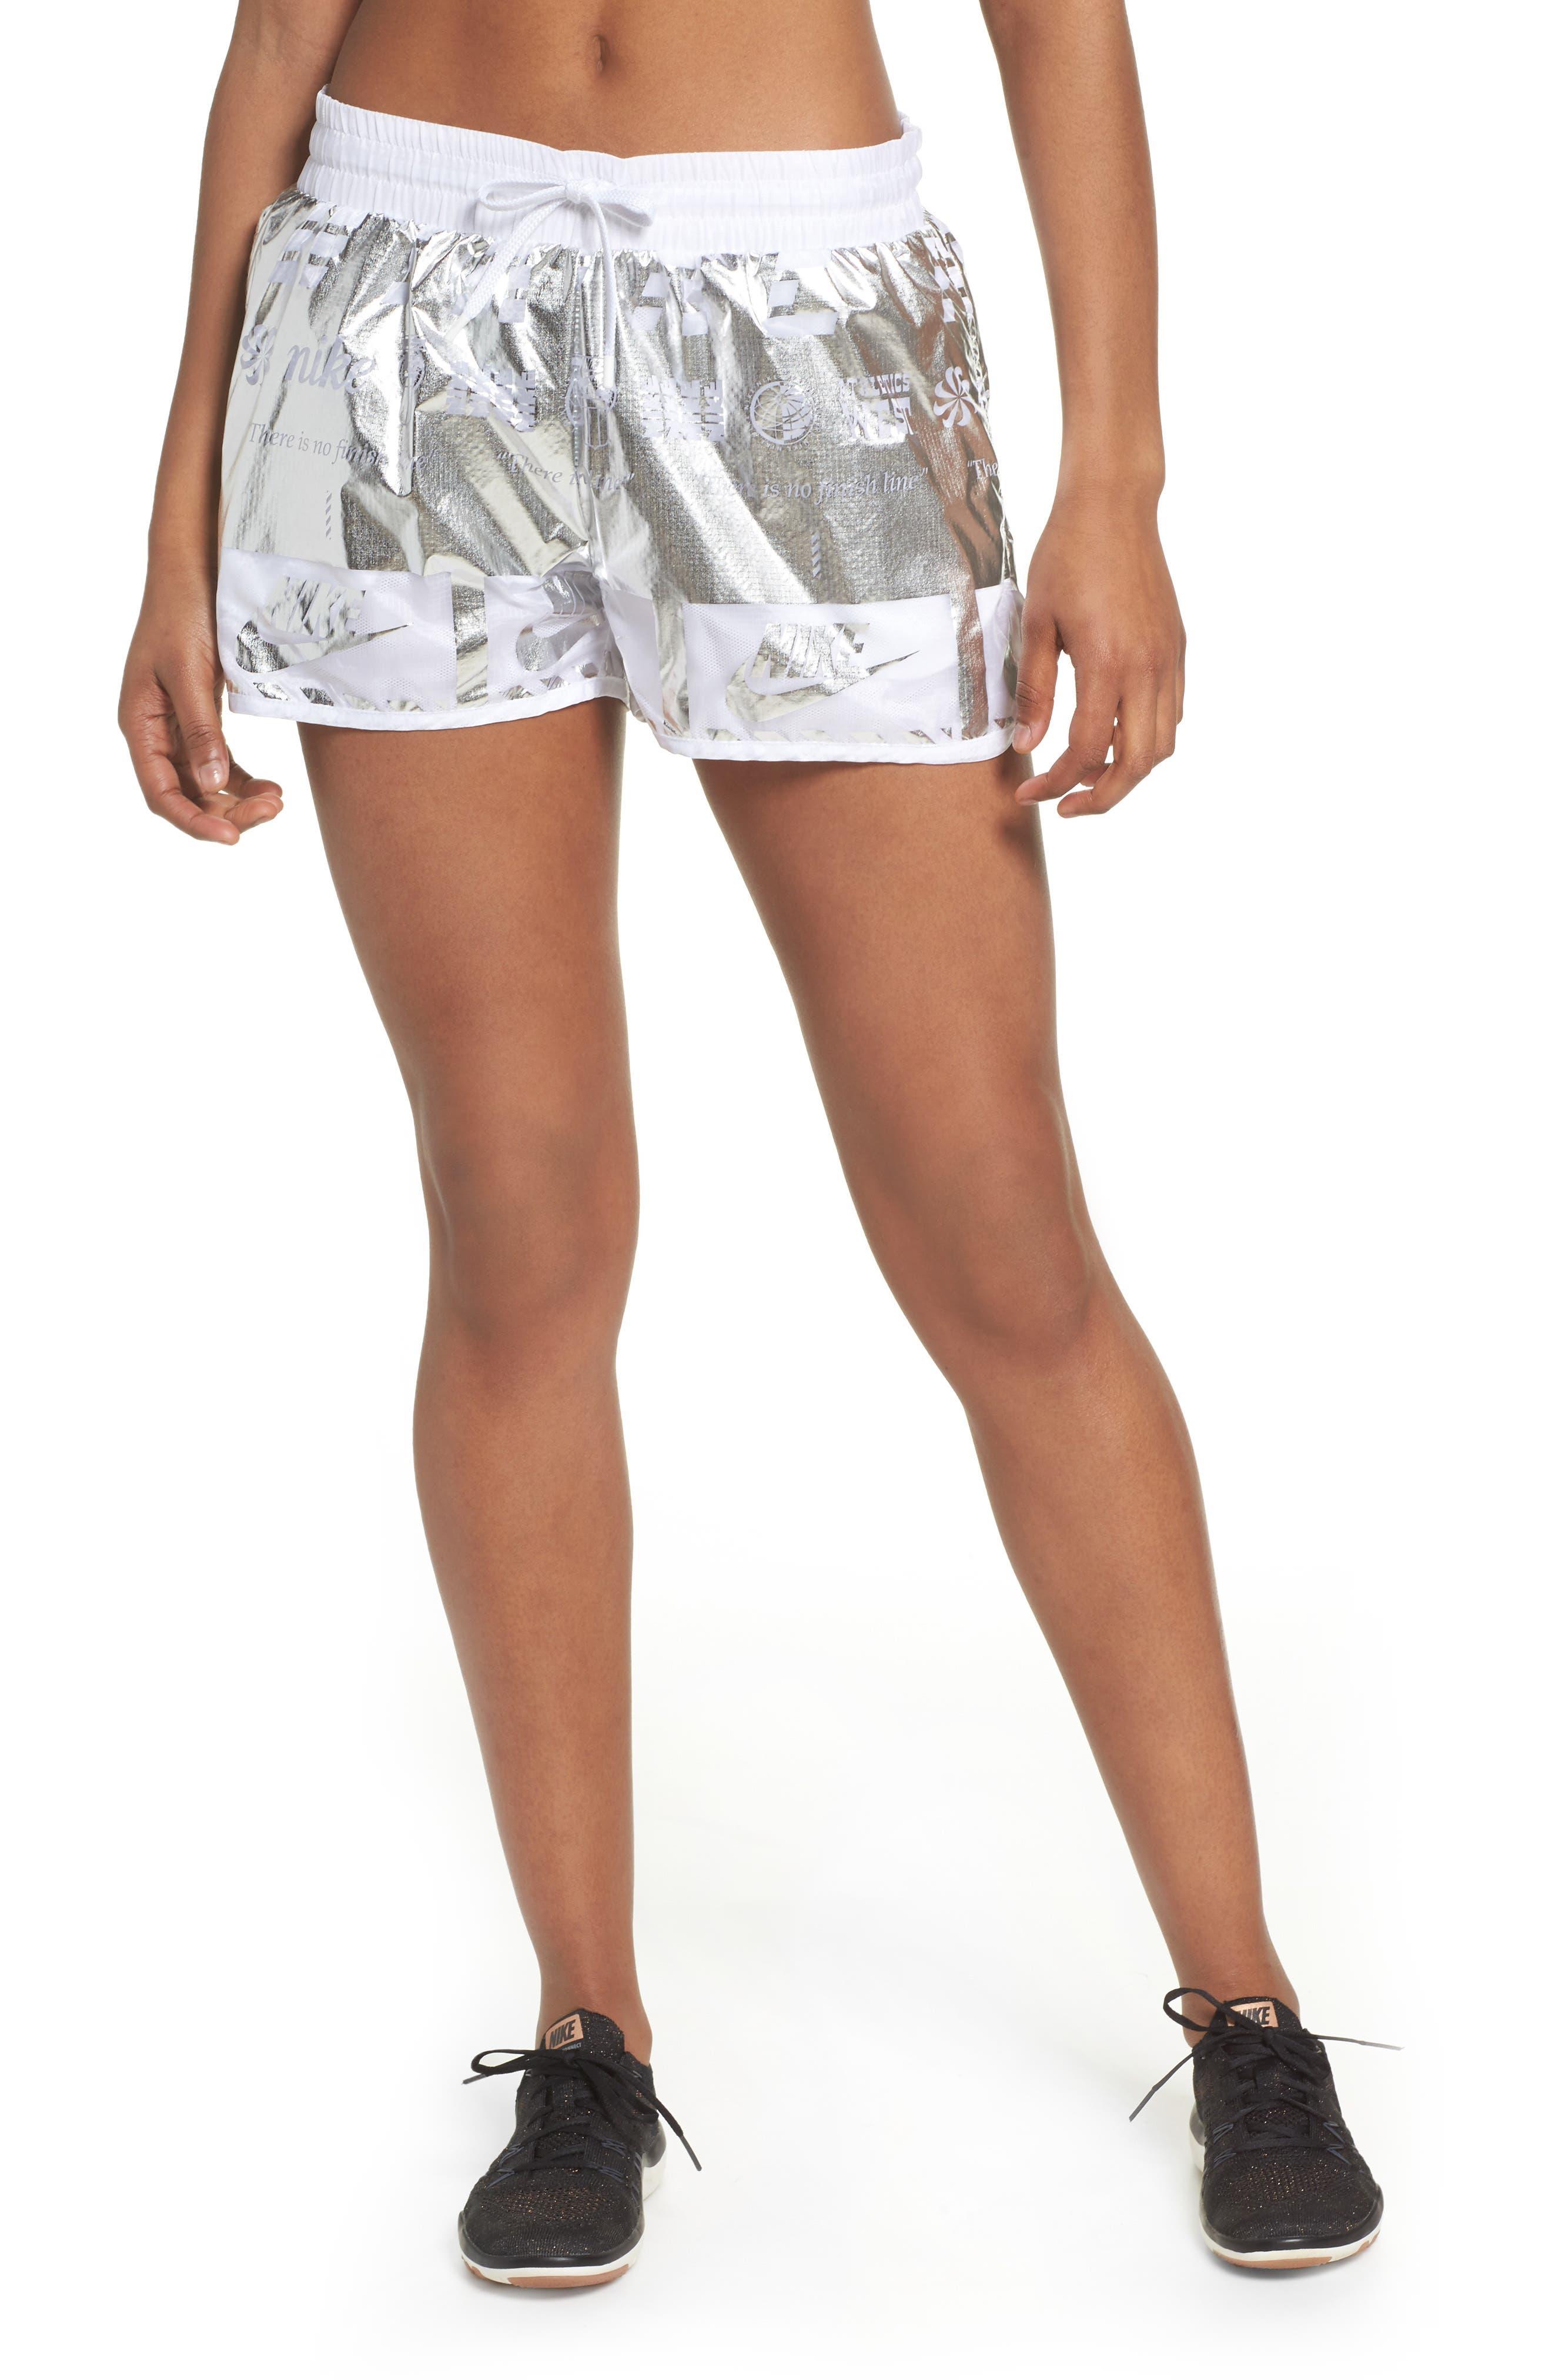 Sportswear Women's Metallic Shorts,                         Main,                         color, White/ White